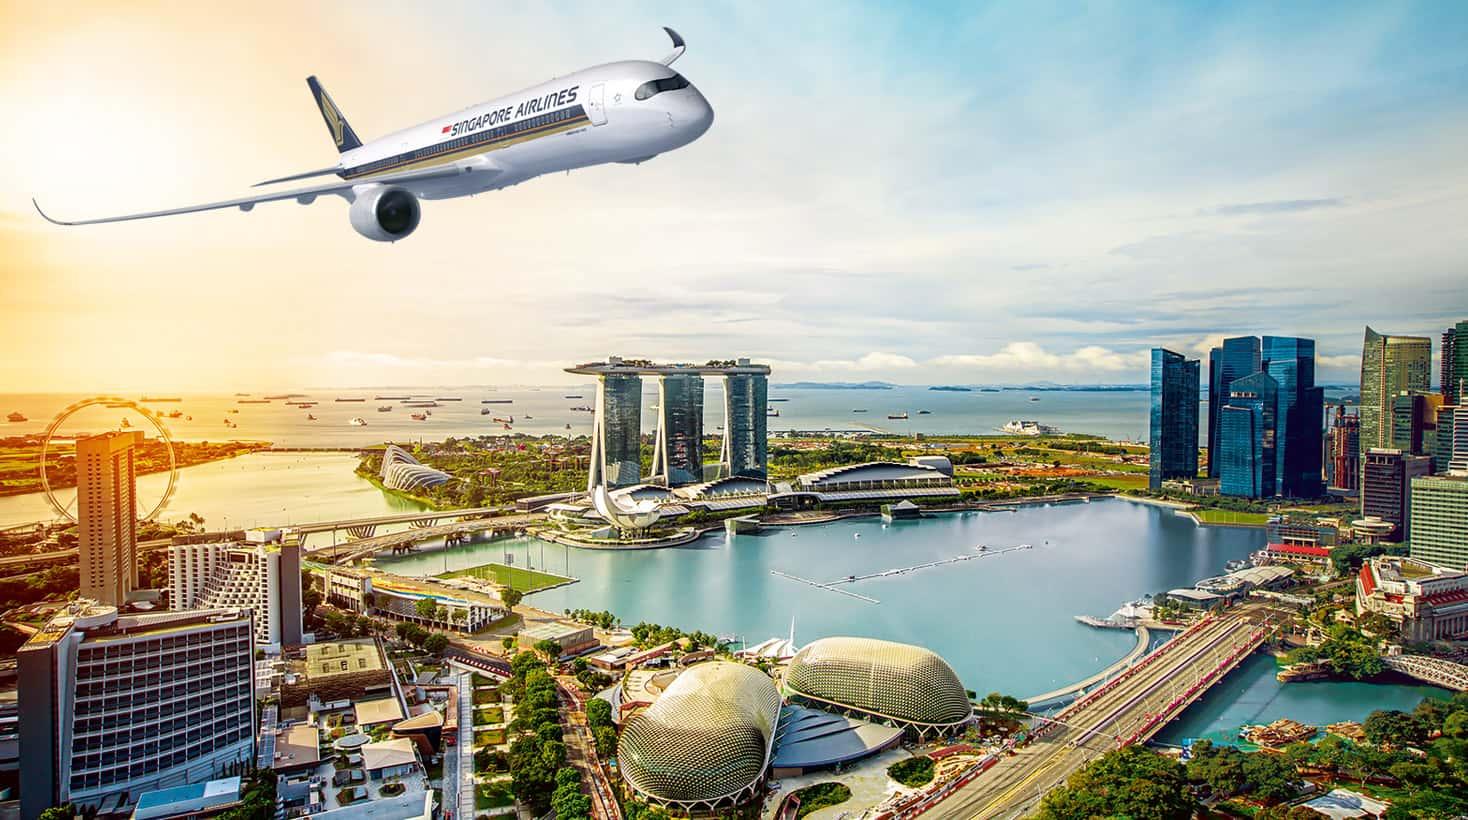 Tiket Promo Singapore Airlines 2019 Terbaru Pergi Com